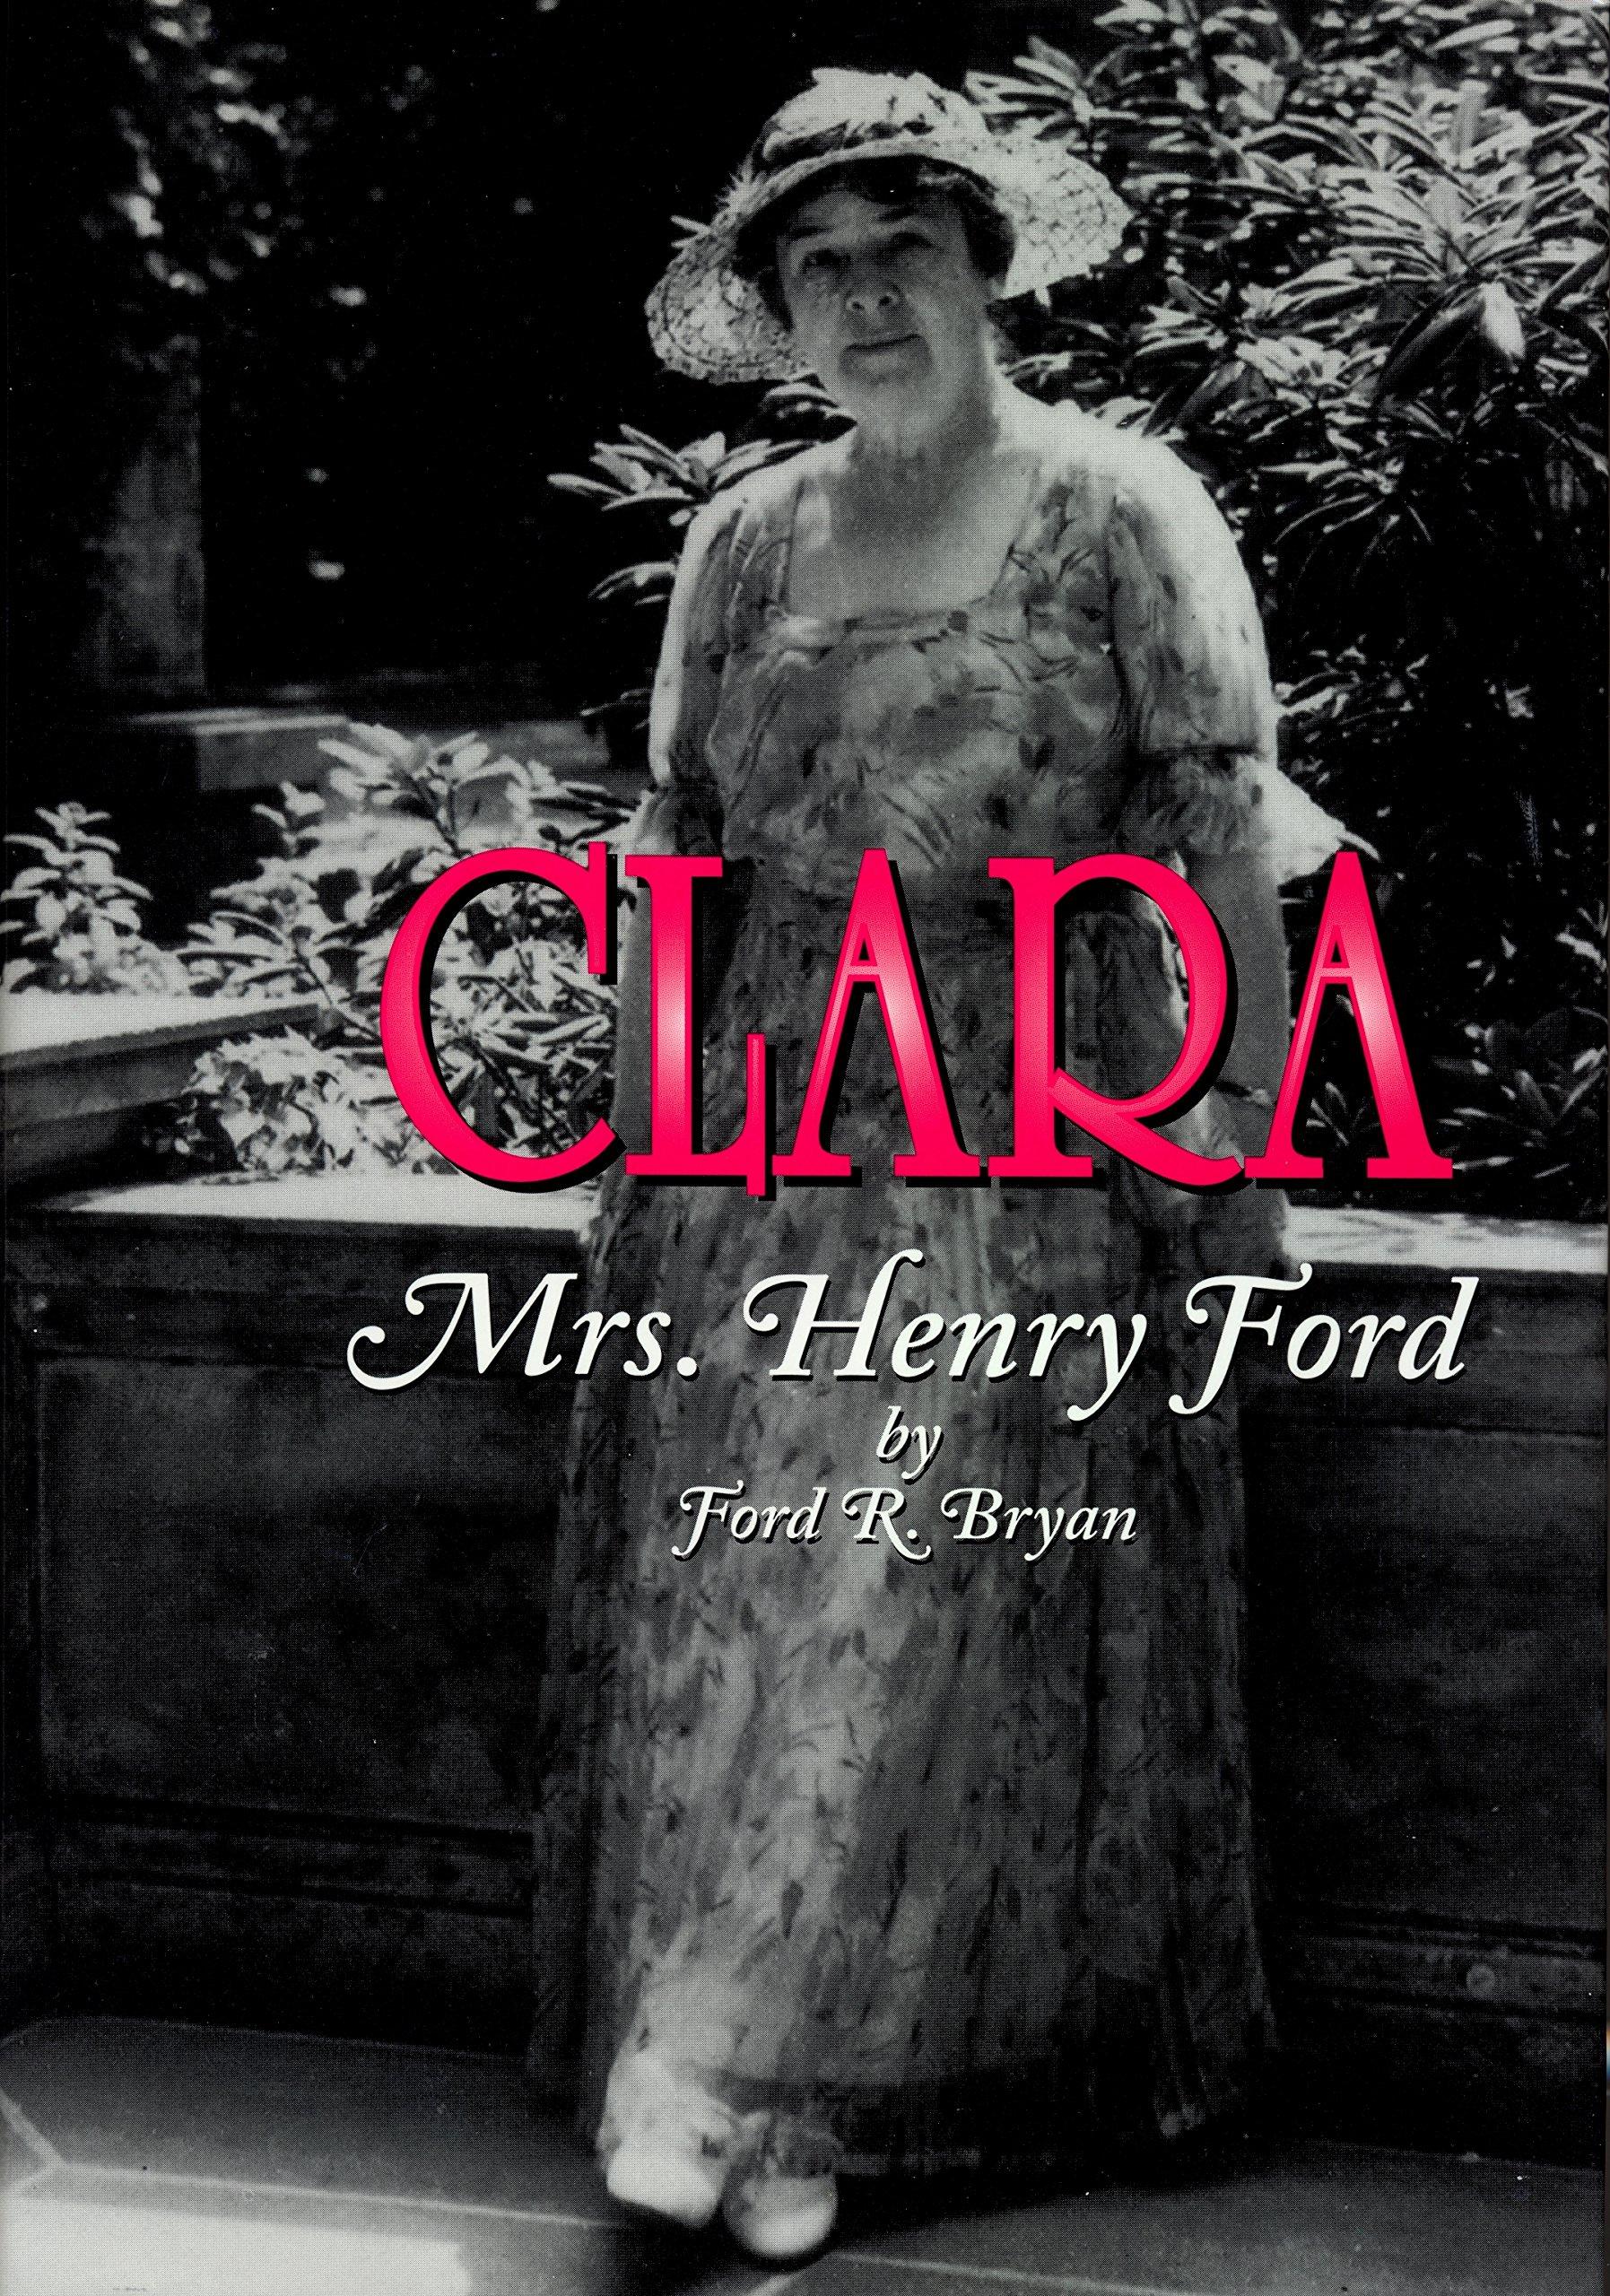 Clara: Mrs. Henry Ford